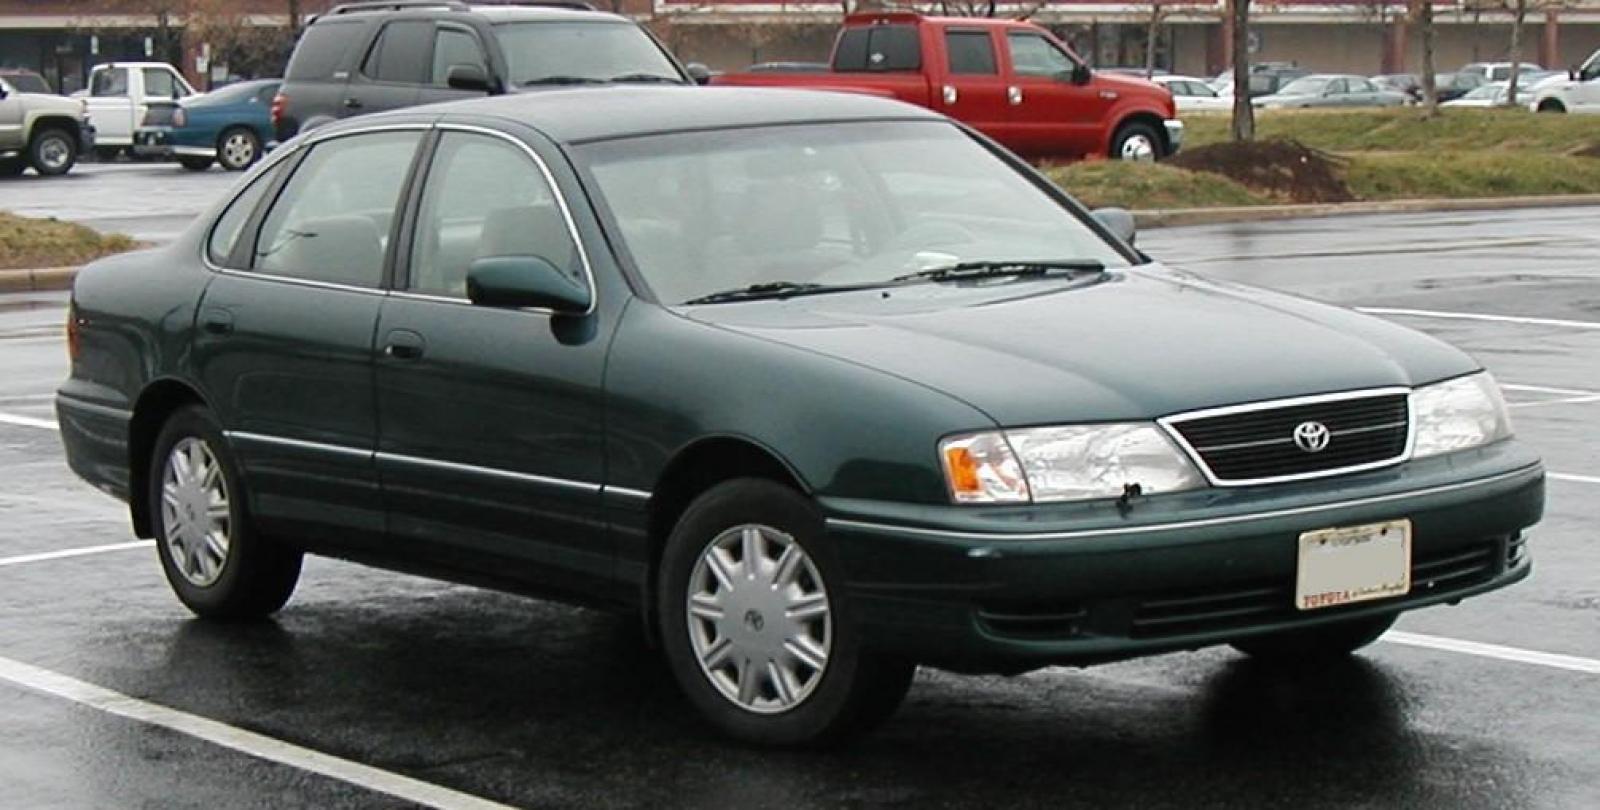 1999 Toyota Avalon #8 Toyota Avalon #8 800 1024 1280 1600 origin ...